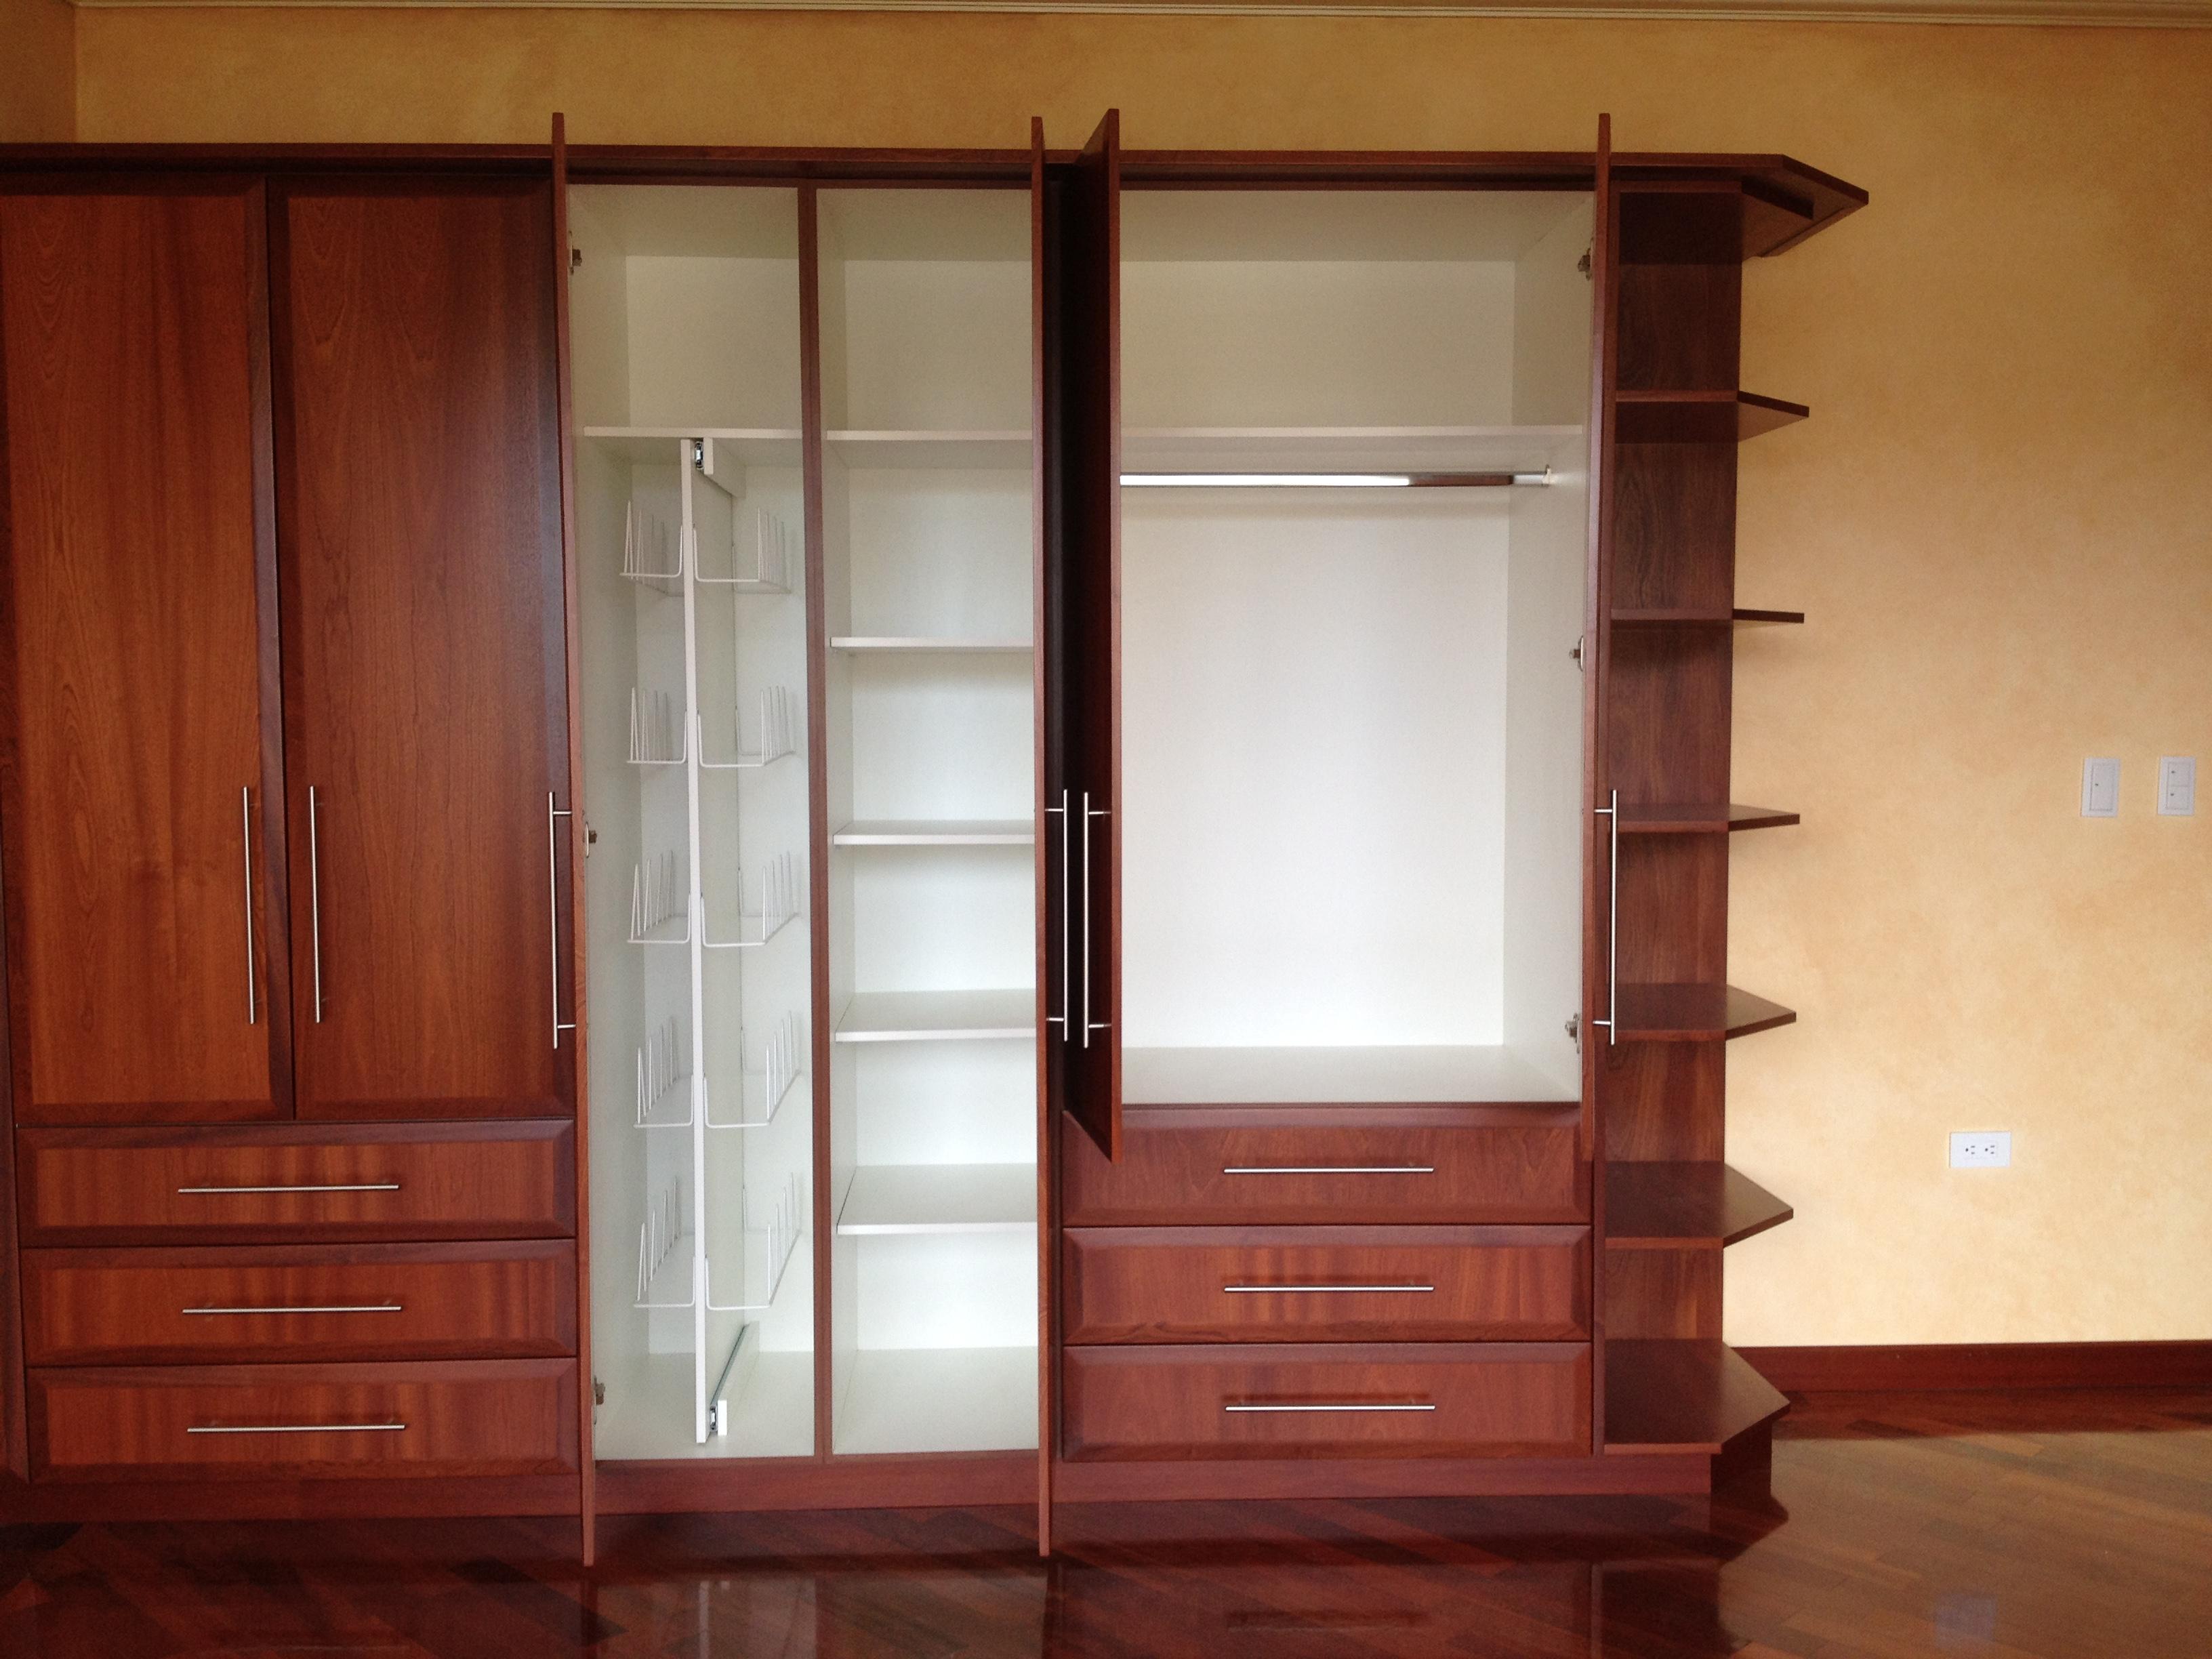 Fabricas de muebles fabrica de muebles - Fabrica muebles portugal ...